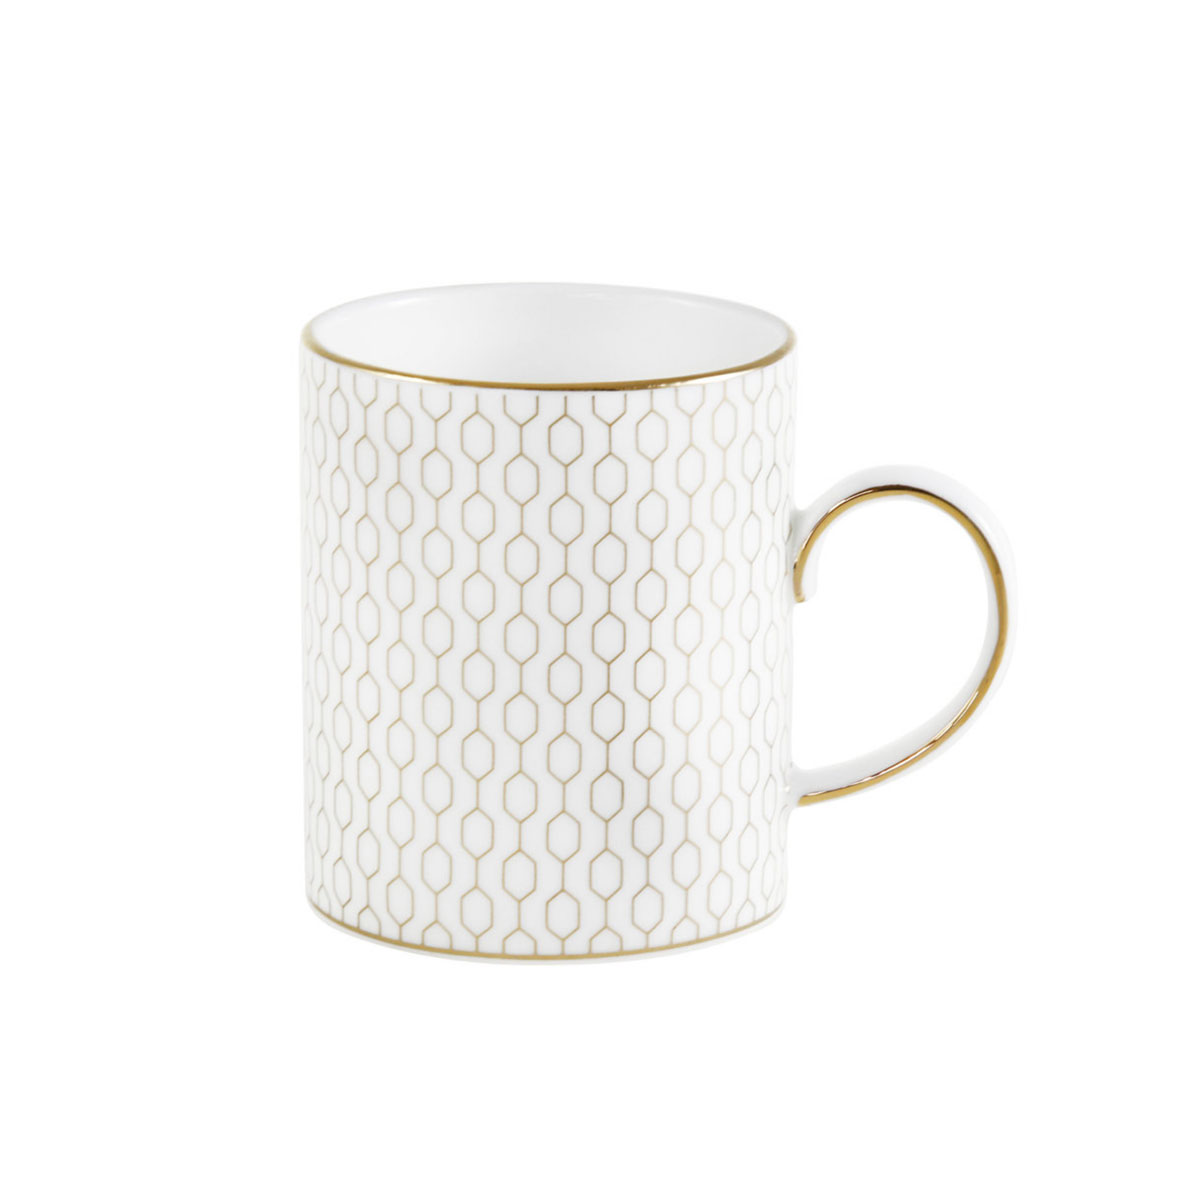 Wedgwood Dinnerware Arris Mug, Single